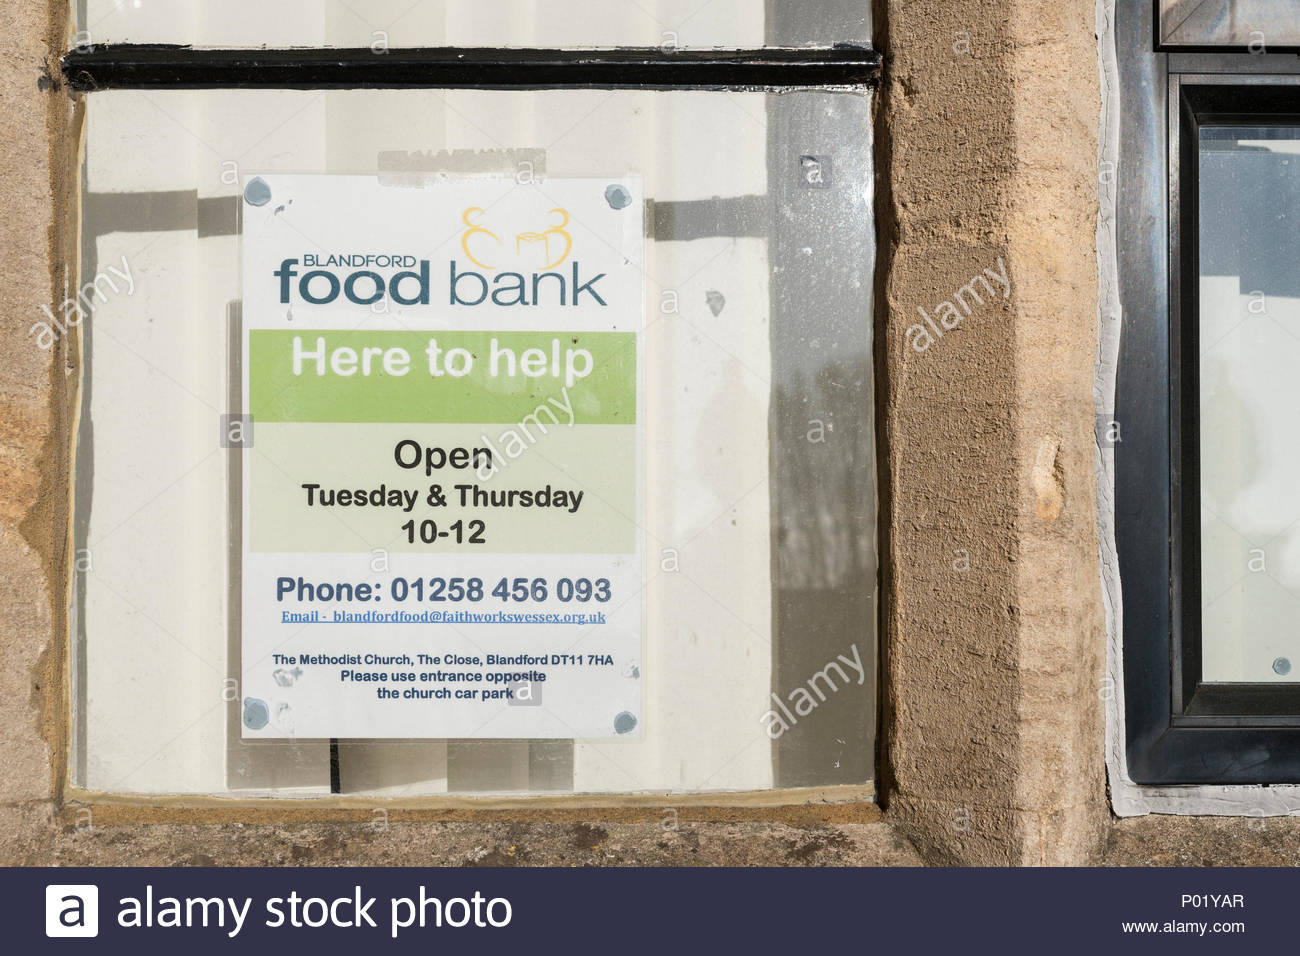 Food bank poster, Blandford, Dorset, England, UK - Stock Image